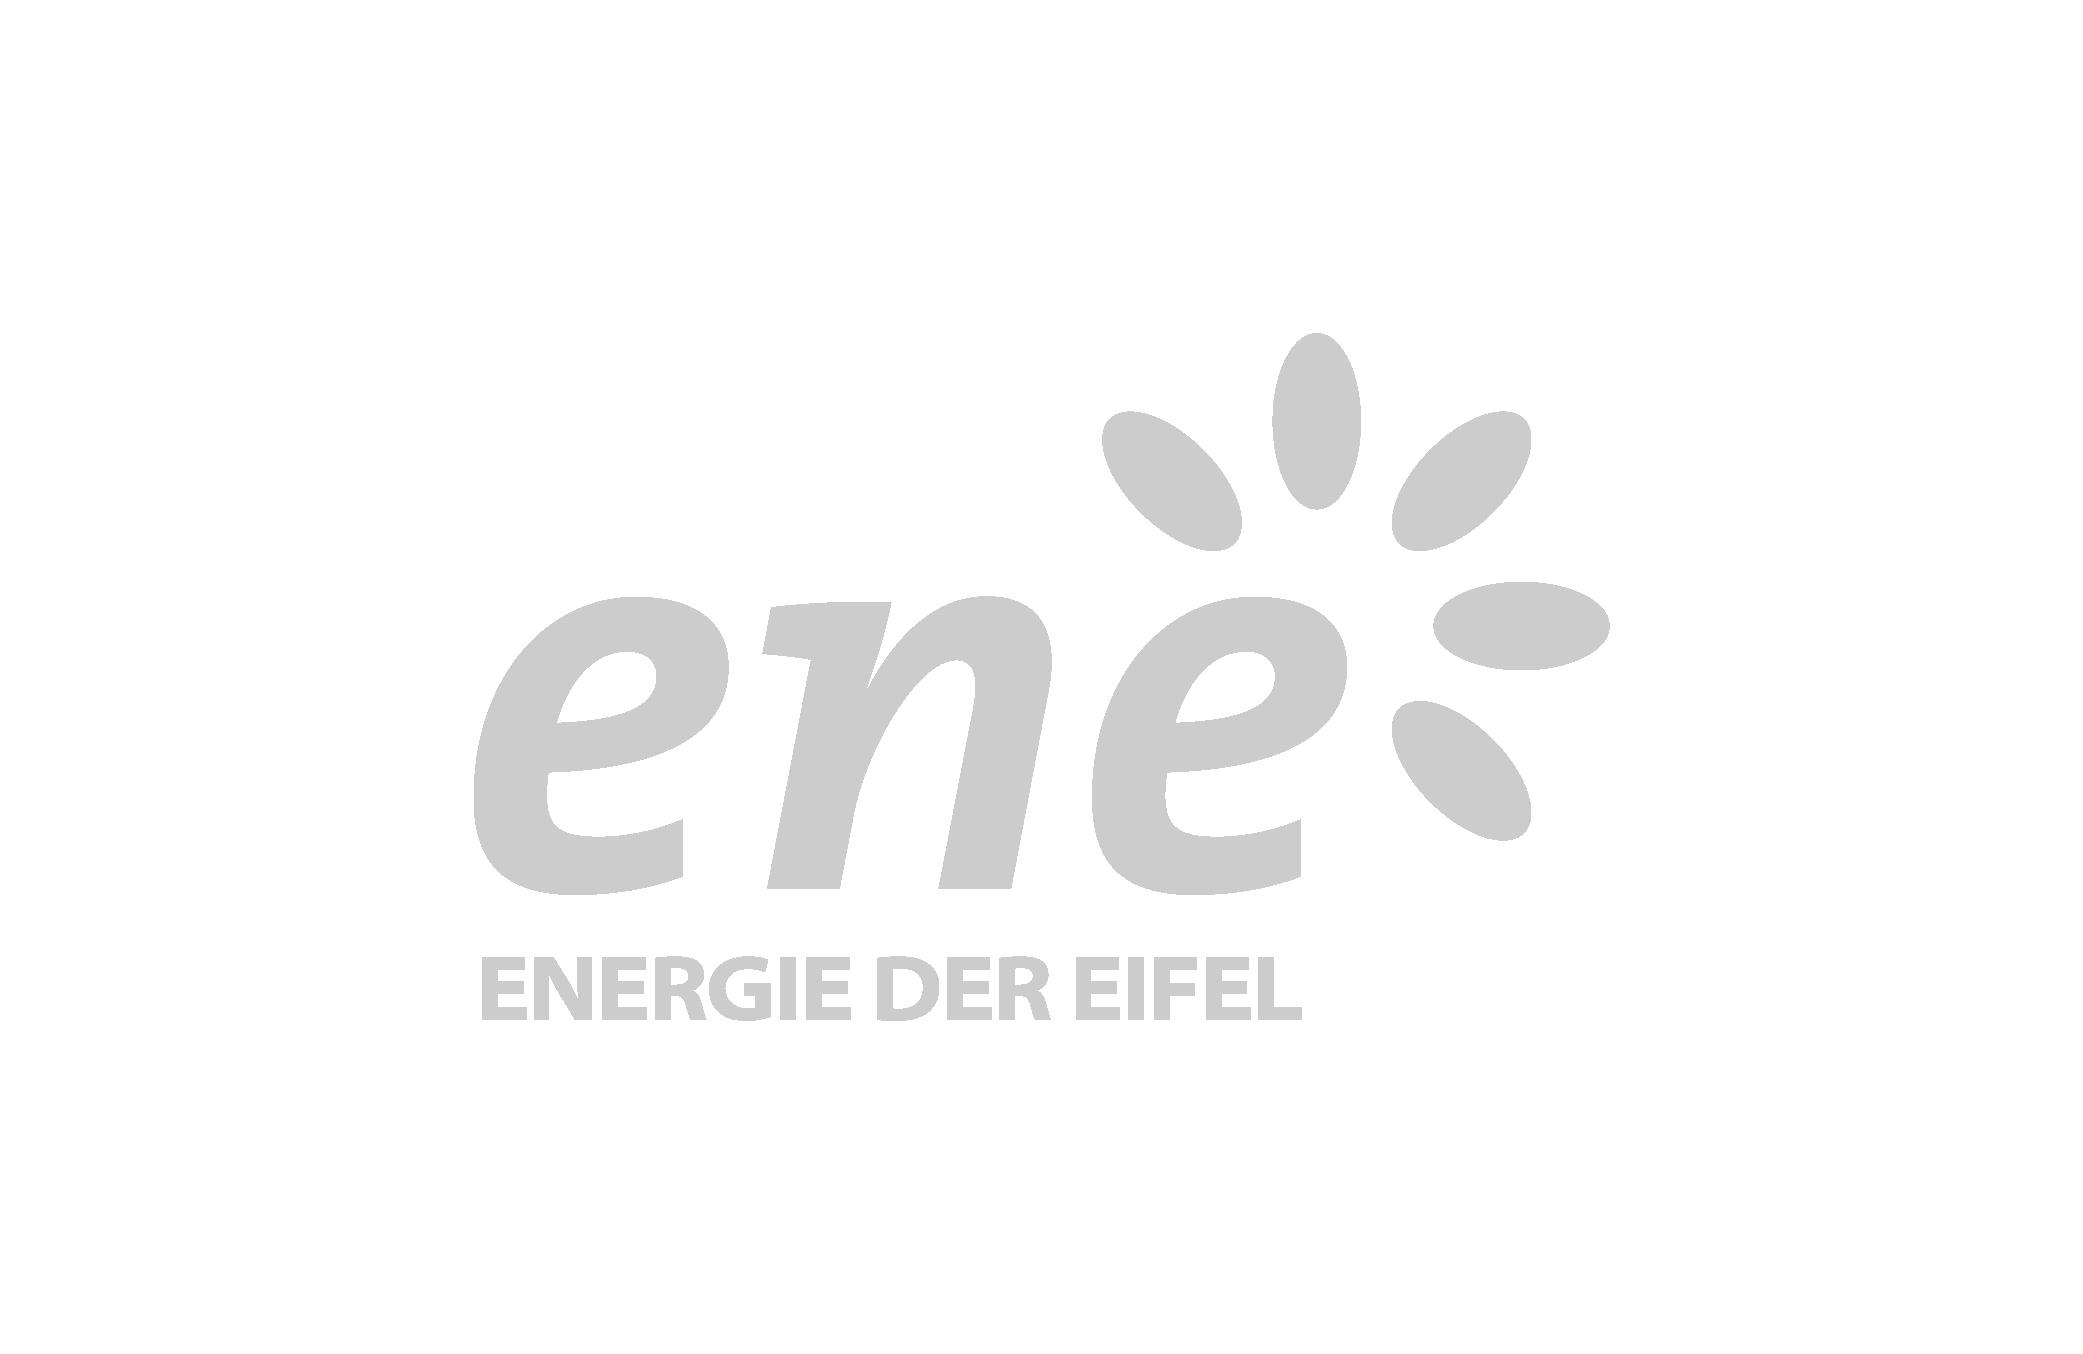 Energie Nordeifel